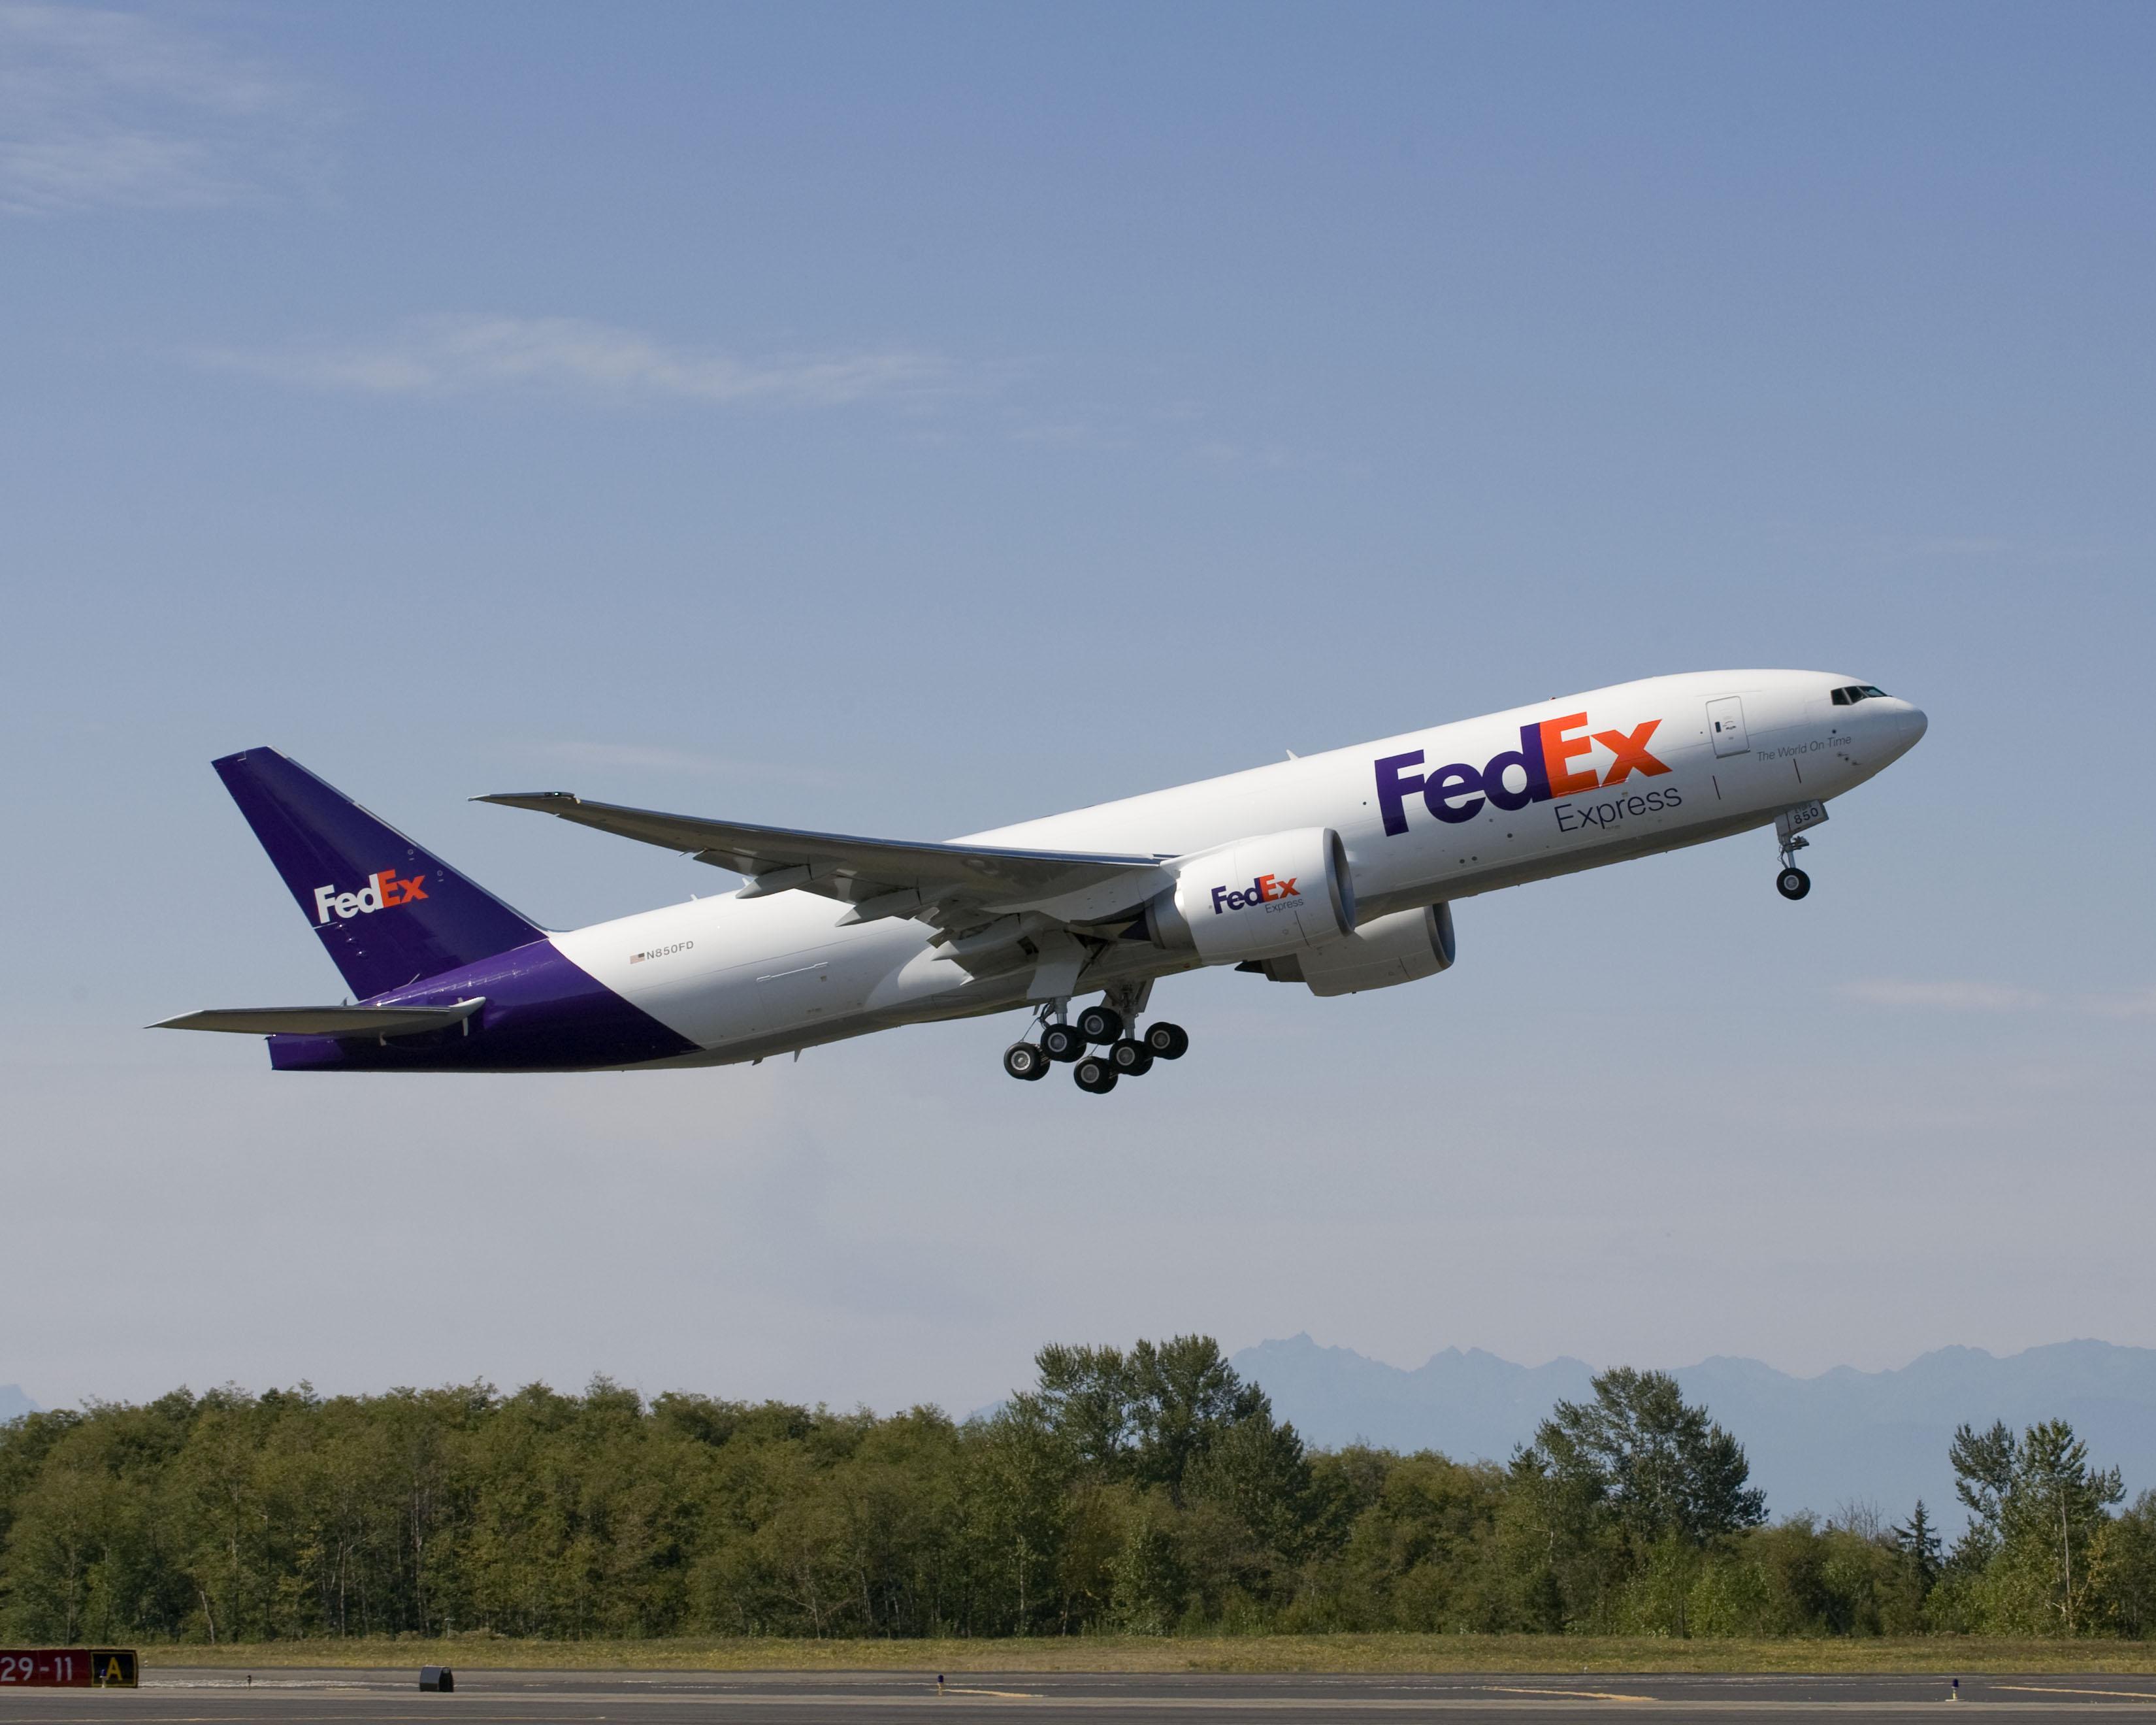 TNT燃油附加费 UPS燃油附加费 FedEx燃油附加费 TNT国际快递 UPS国际快递 FedEx国际快递 联邦国际快递 燃油附加费 国际快递